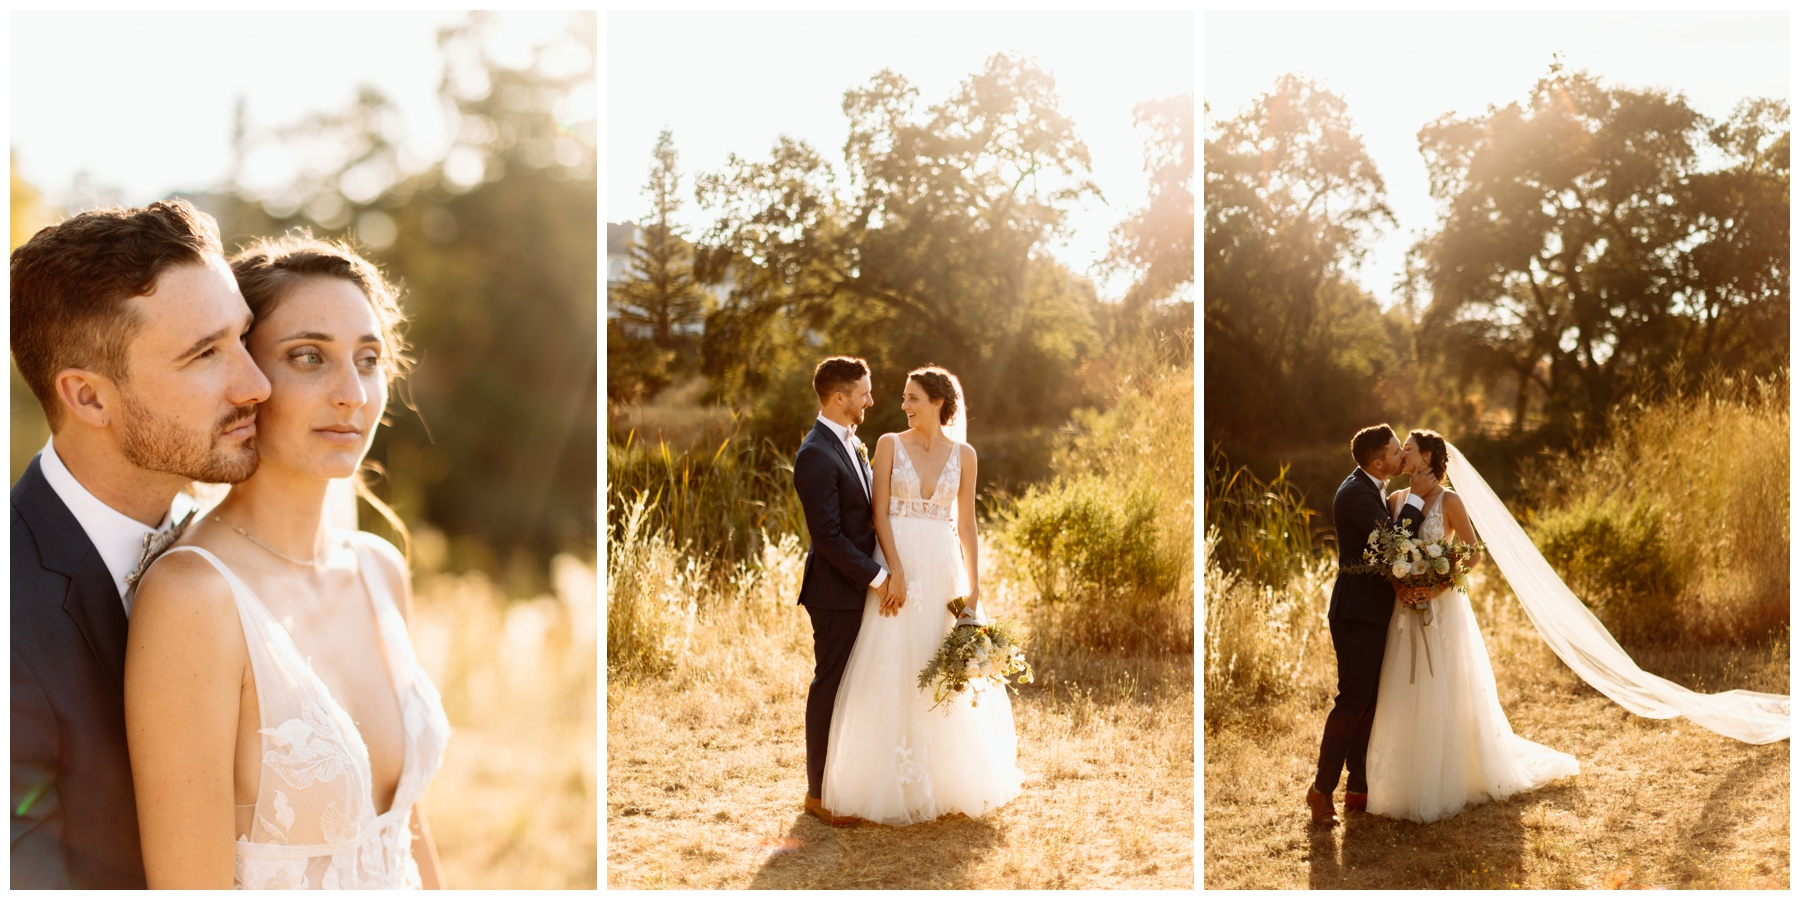 Sunset portraits of bride and groom at Highland Estate Wedding